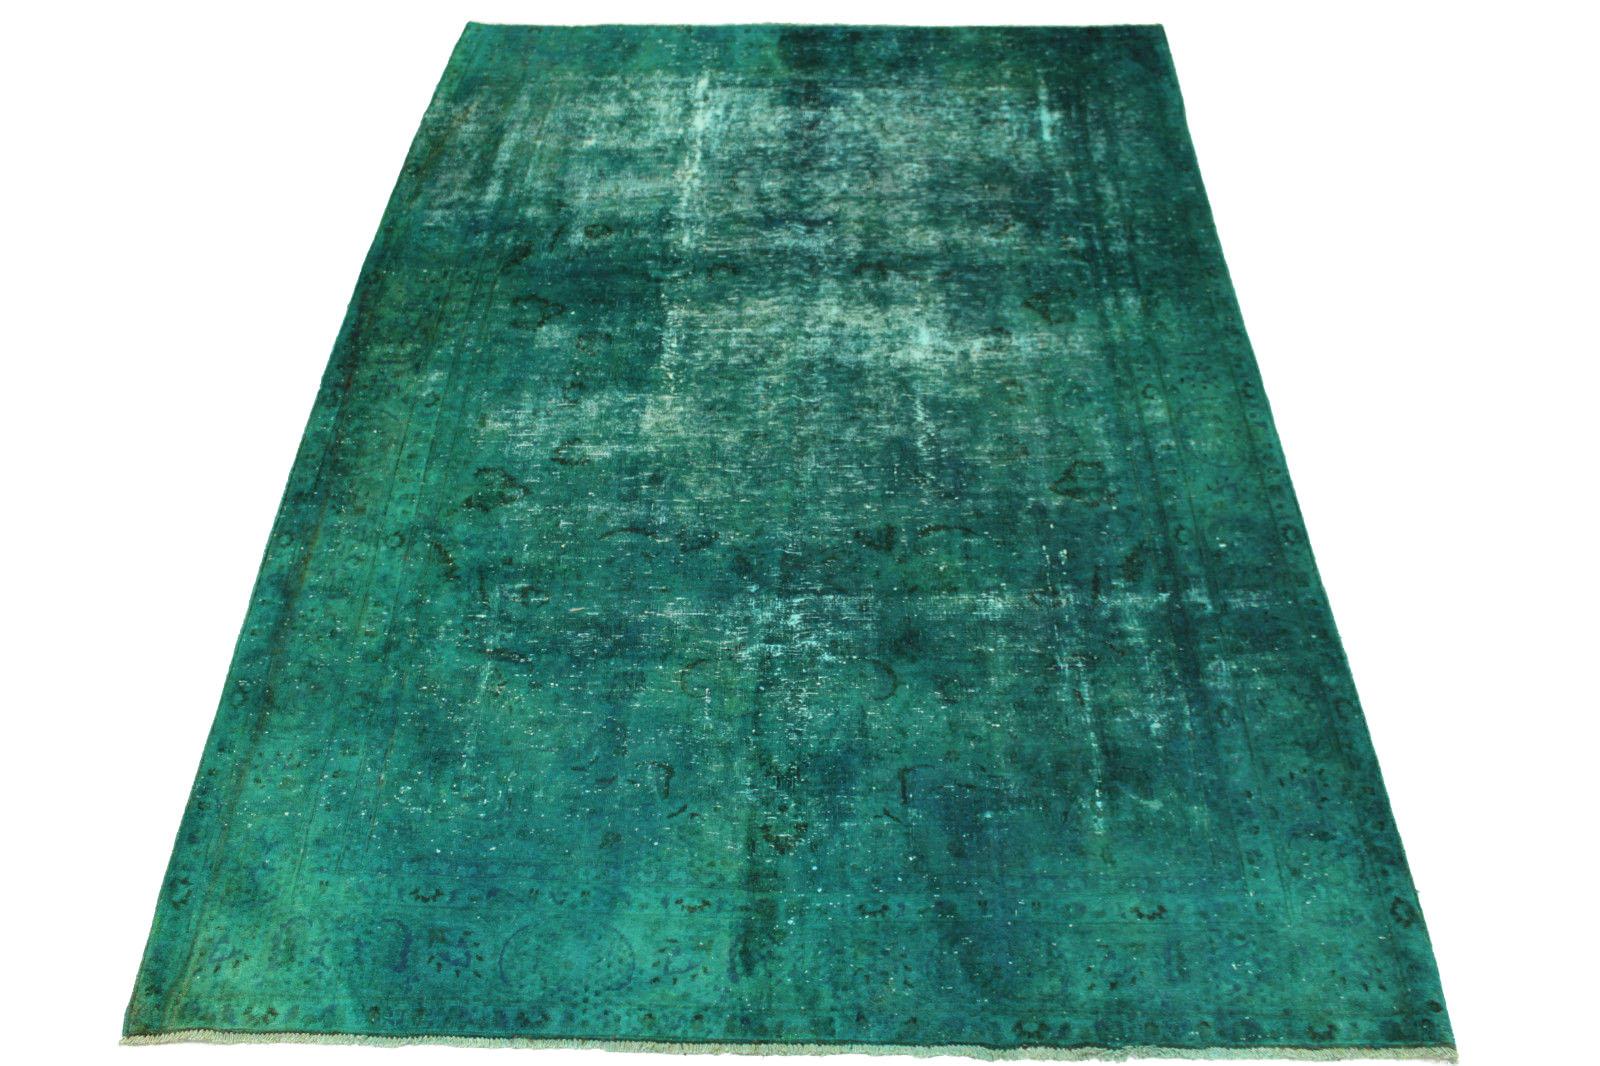 vintage teppich t rkis in 270x190cm 1001 2419 bei kaufen. Black Bedroom Furniture Sets. Home Design Ideas